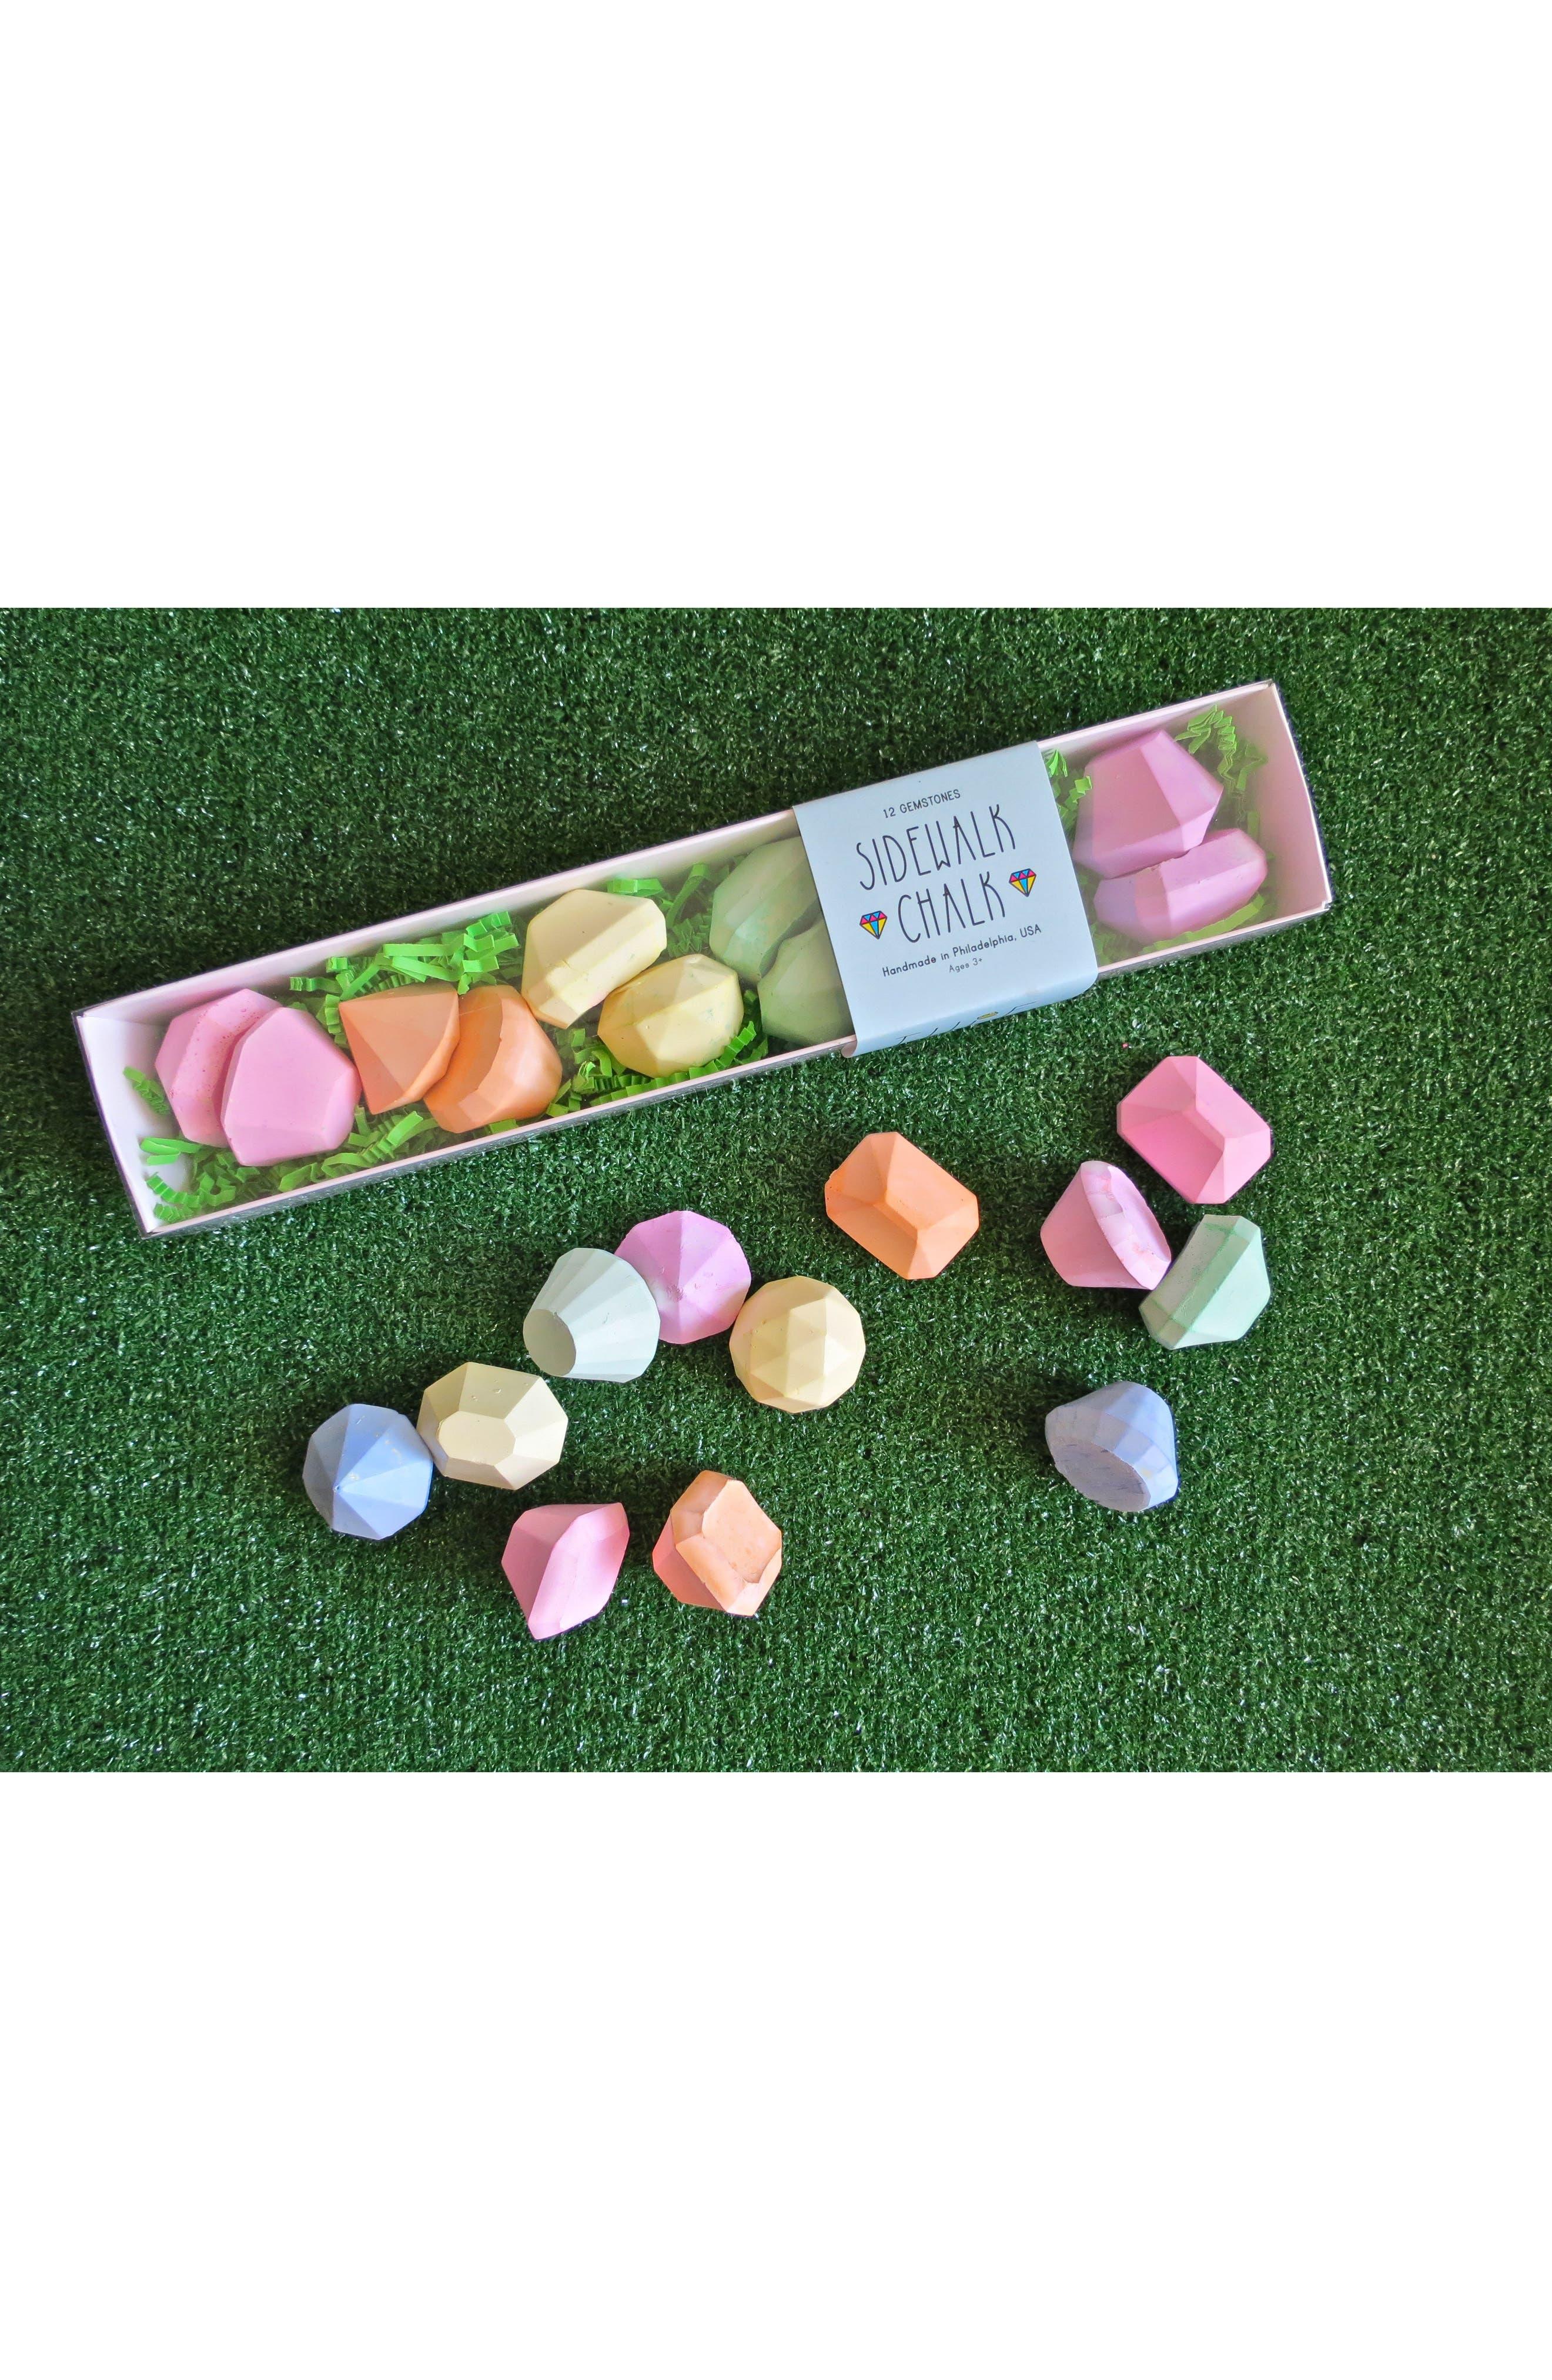 24-Piece Gemstone Sidewalk Chalk Set,                             Main thumbnail 1, color,                             300